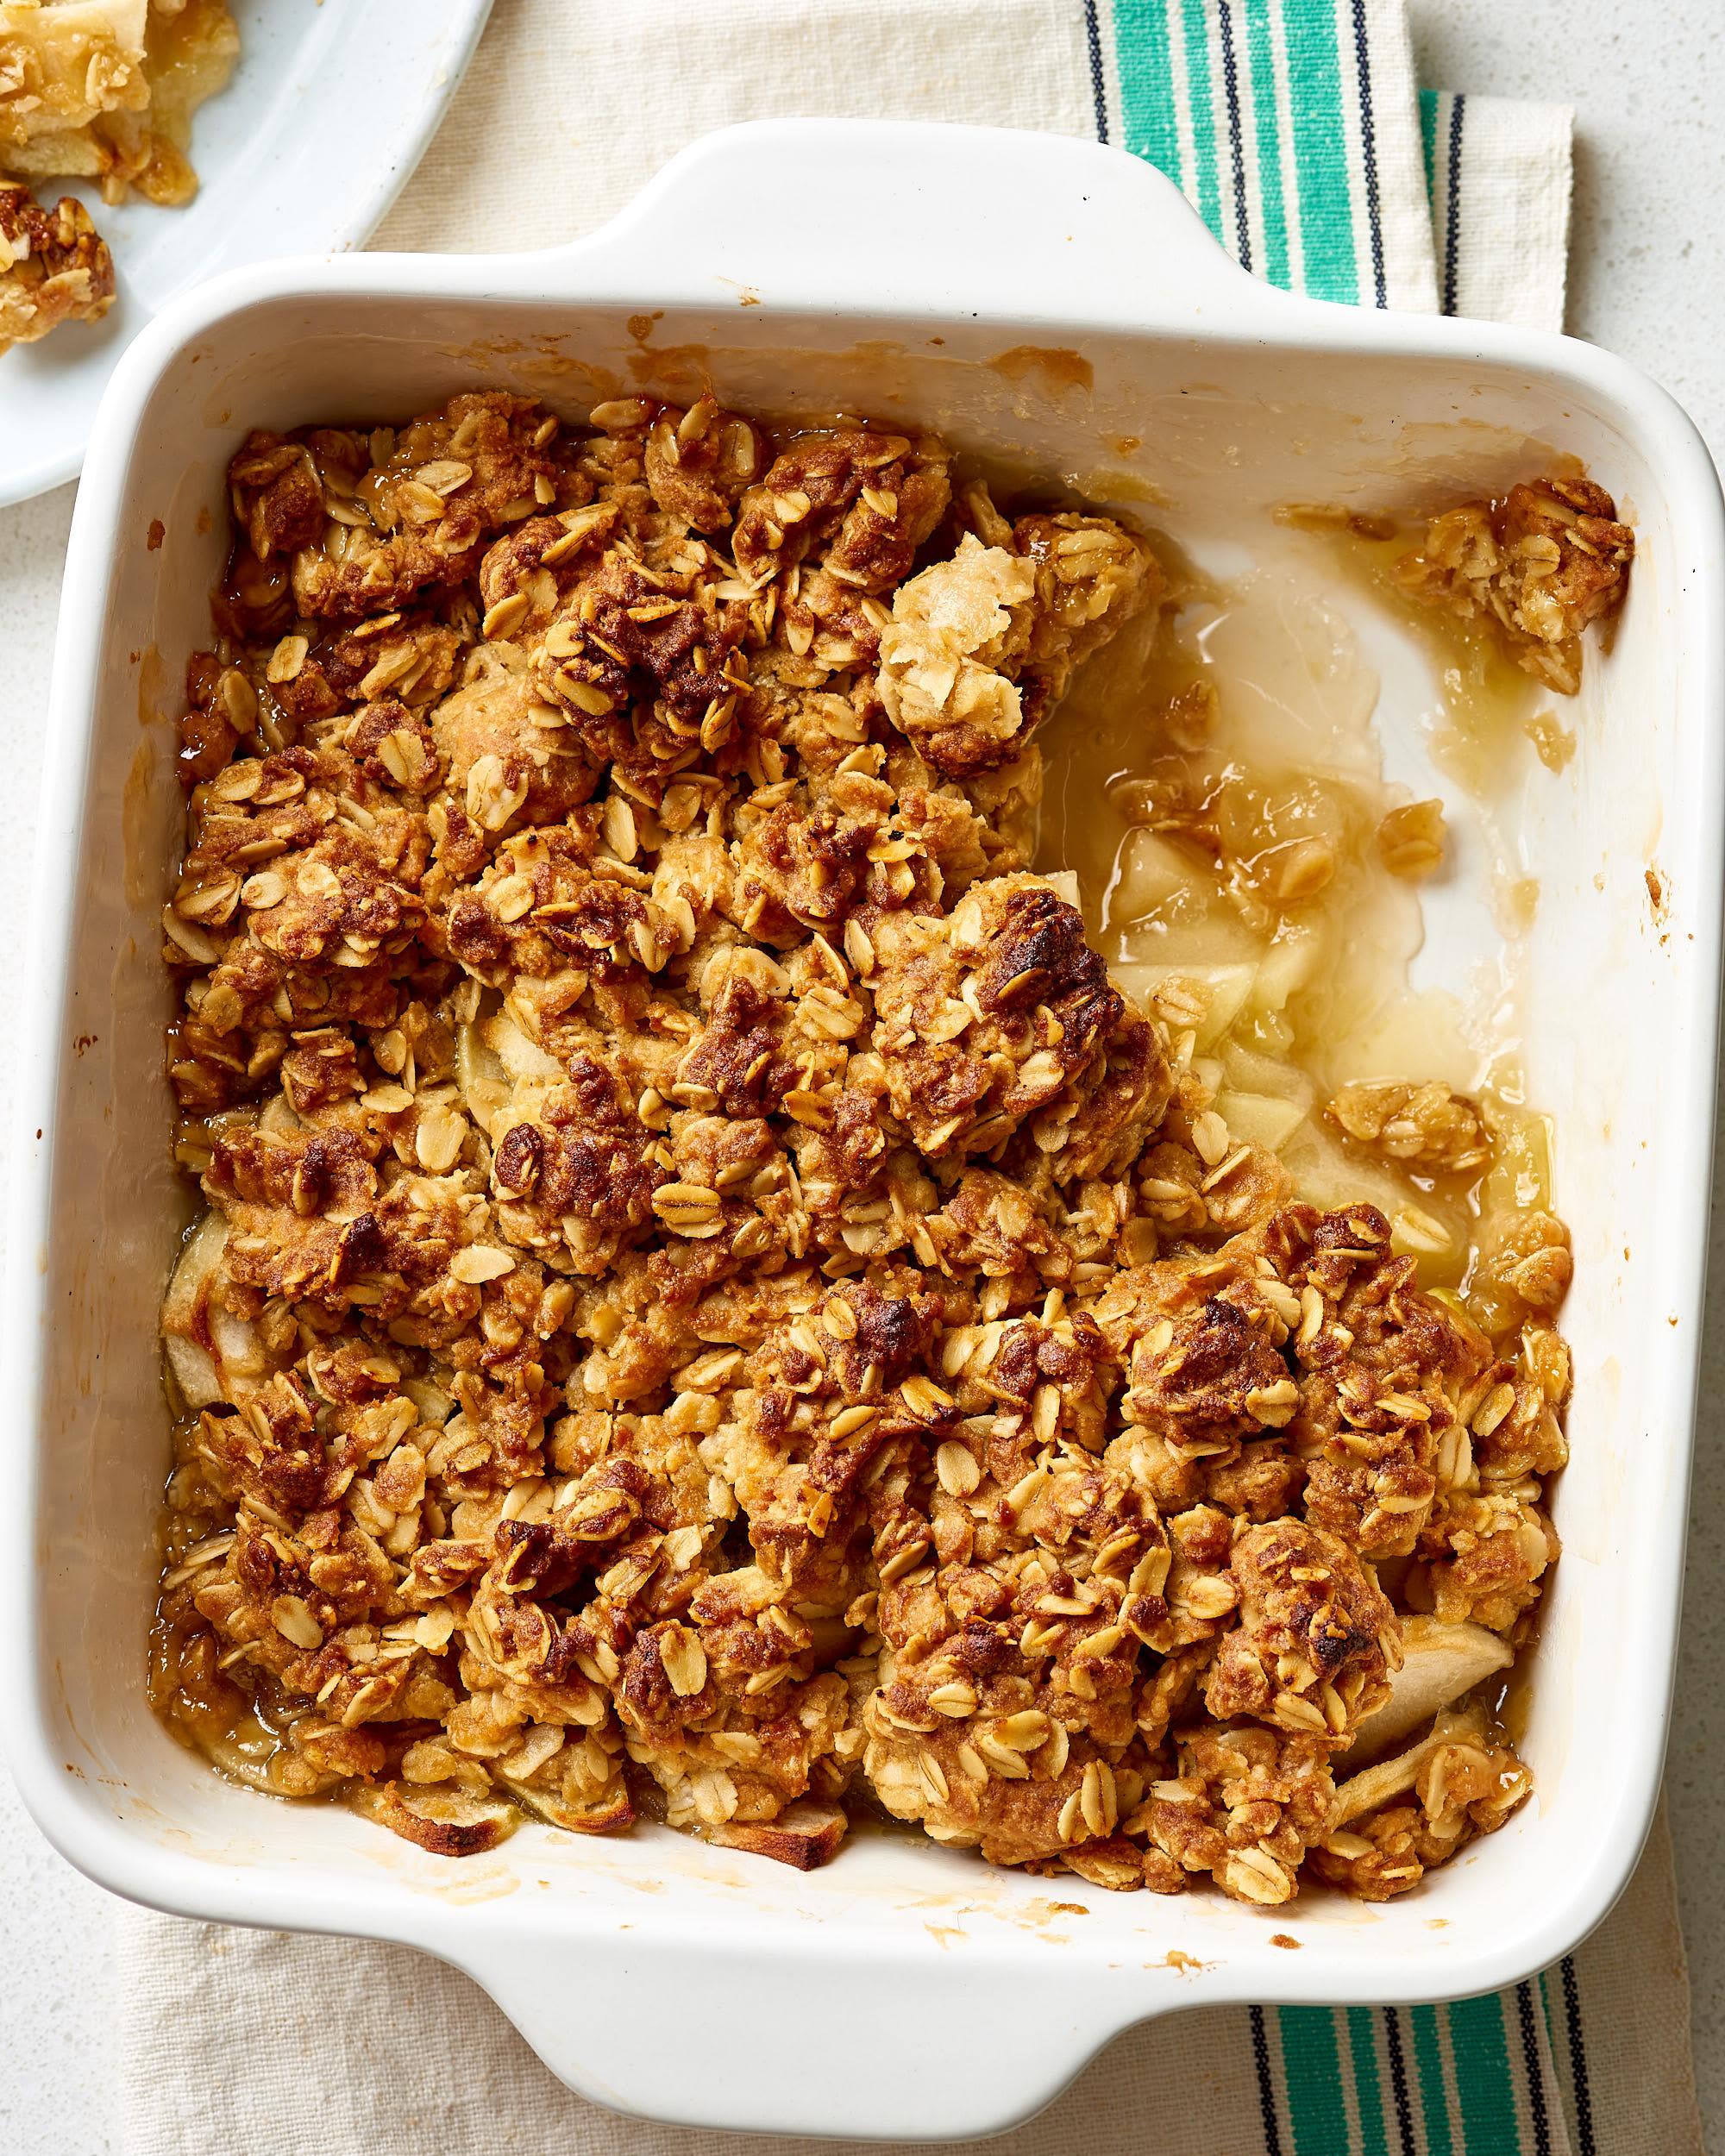 How To Make the Best, Easiest Apple Crisp